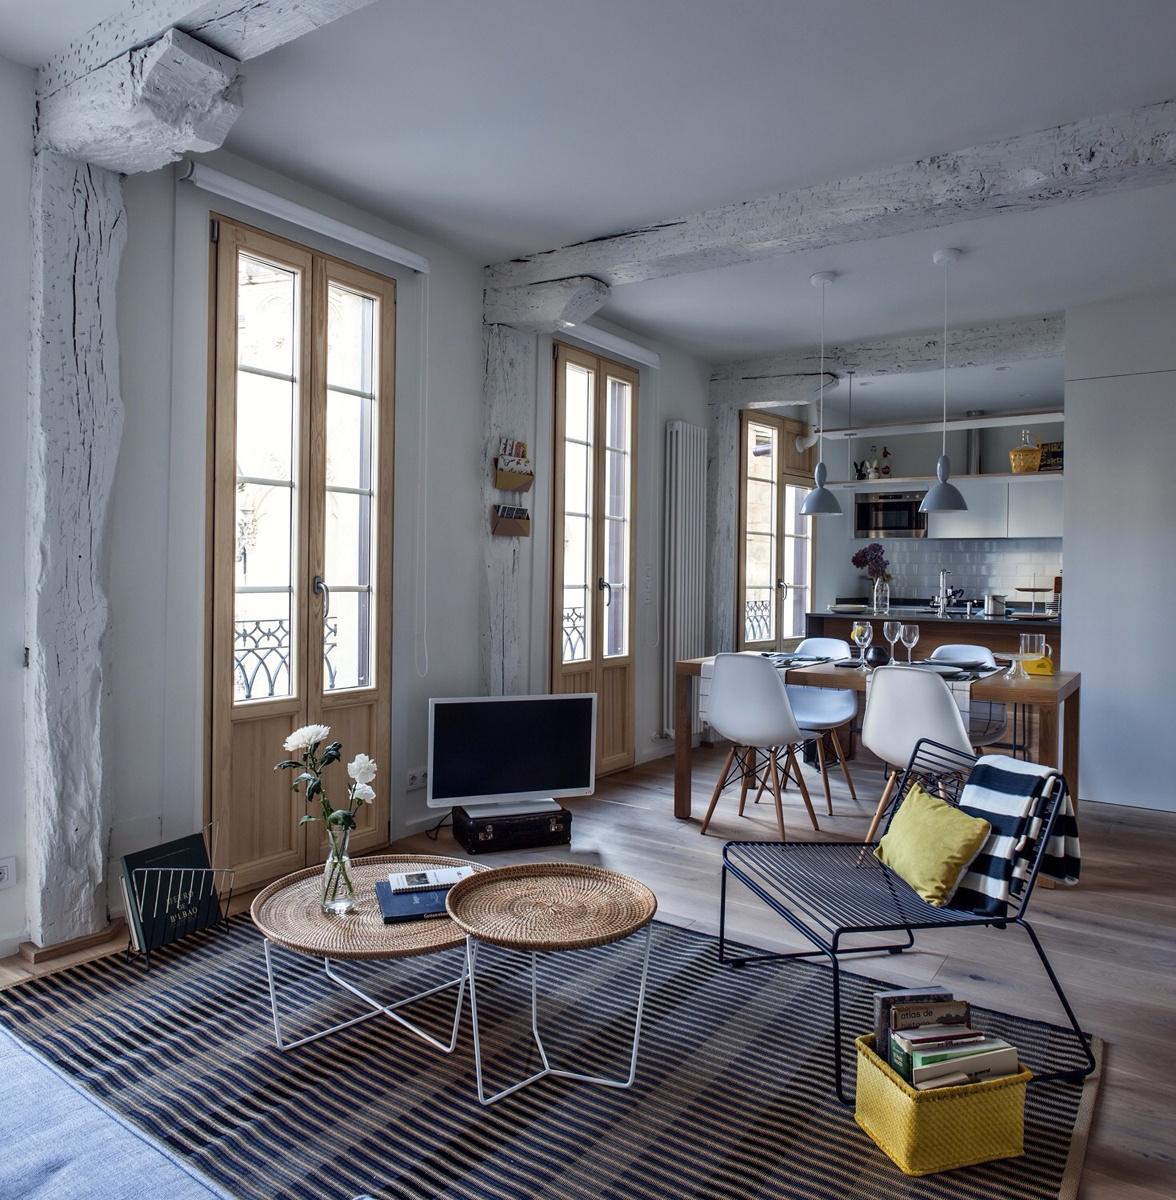 Decordemon nordic atmosphere in bilbao spain for 360 the colour bar salon